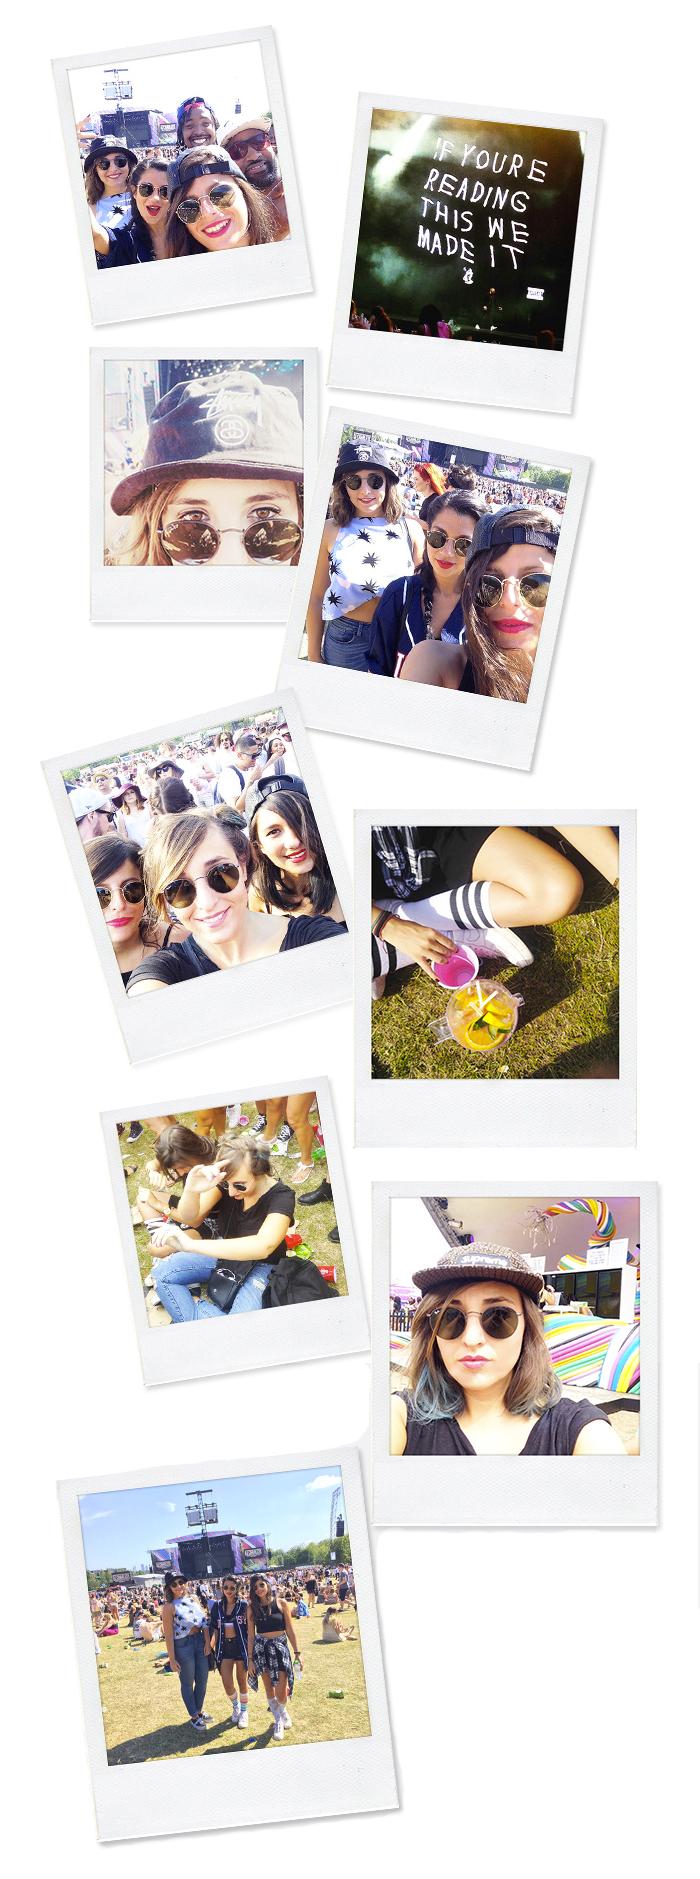 instagram-wirelessfestival